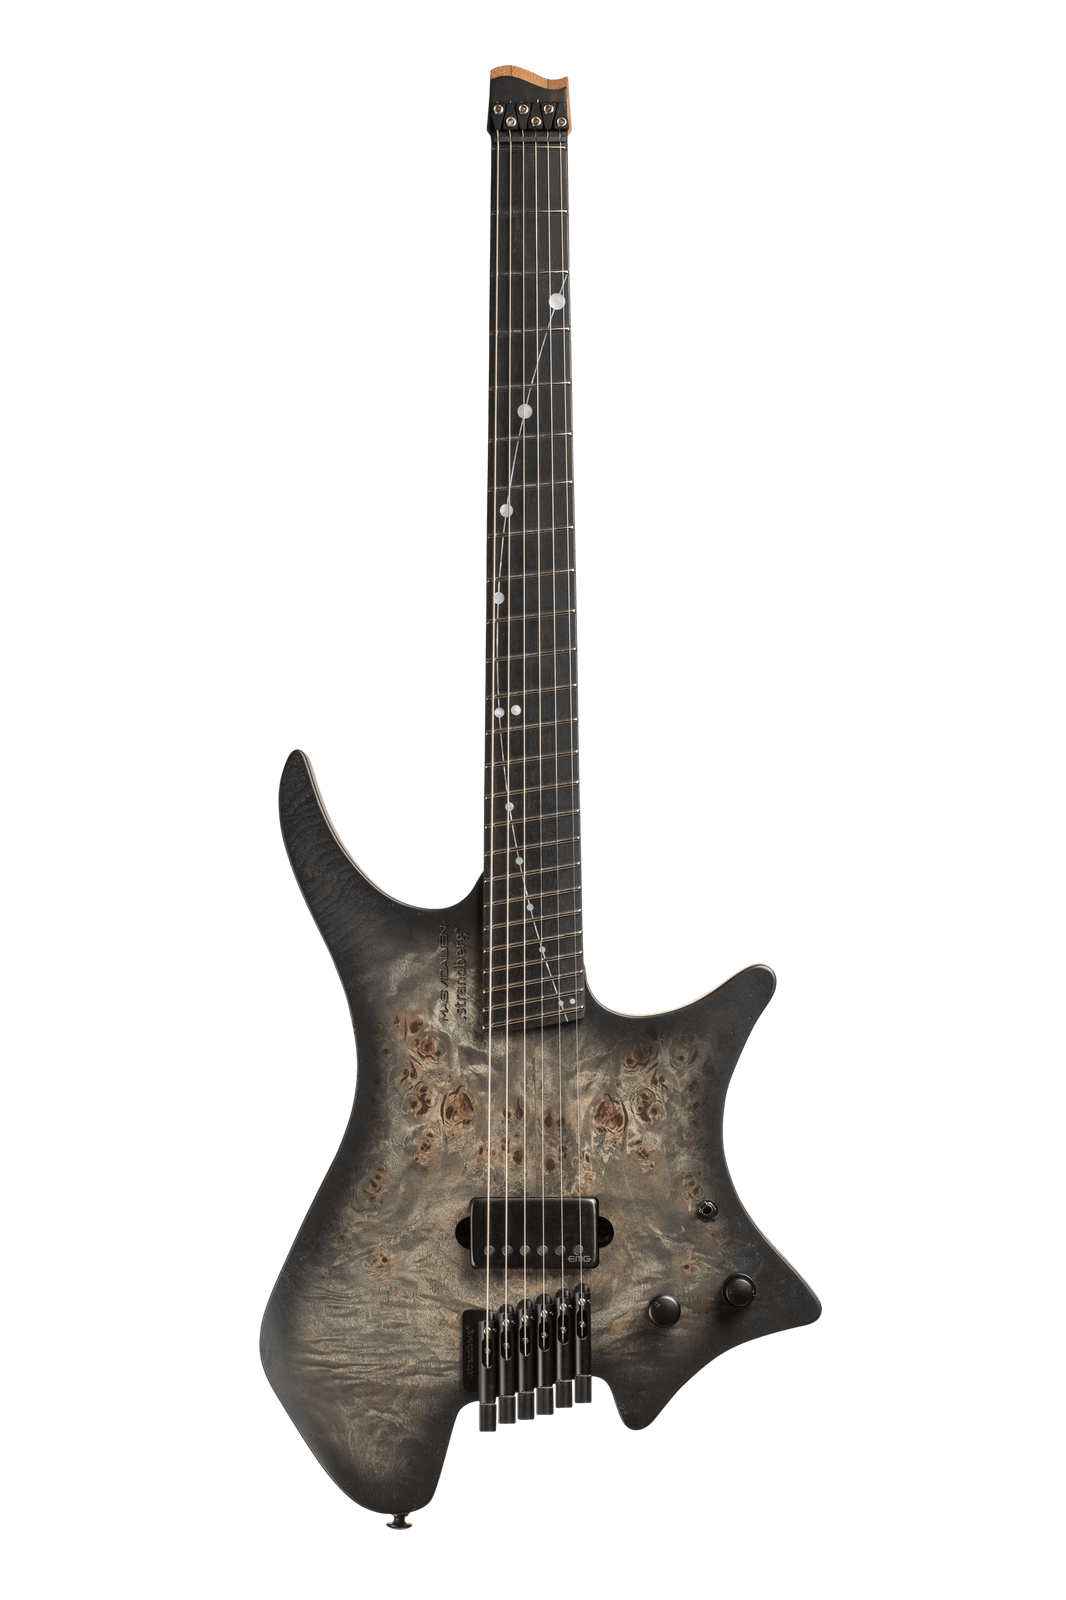 Boden Masvidalien Cosmo Headless Guitar